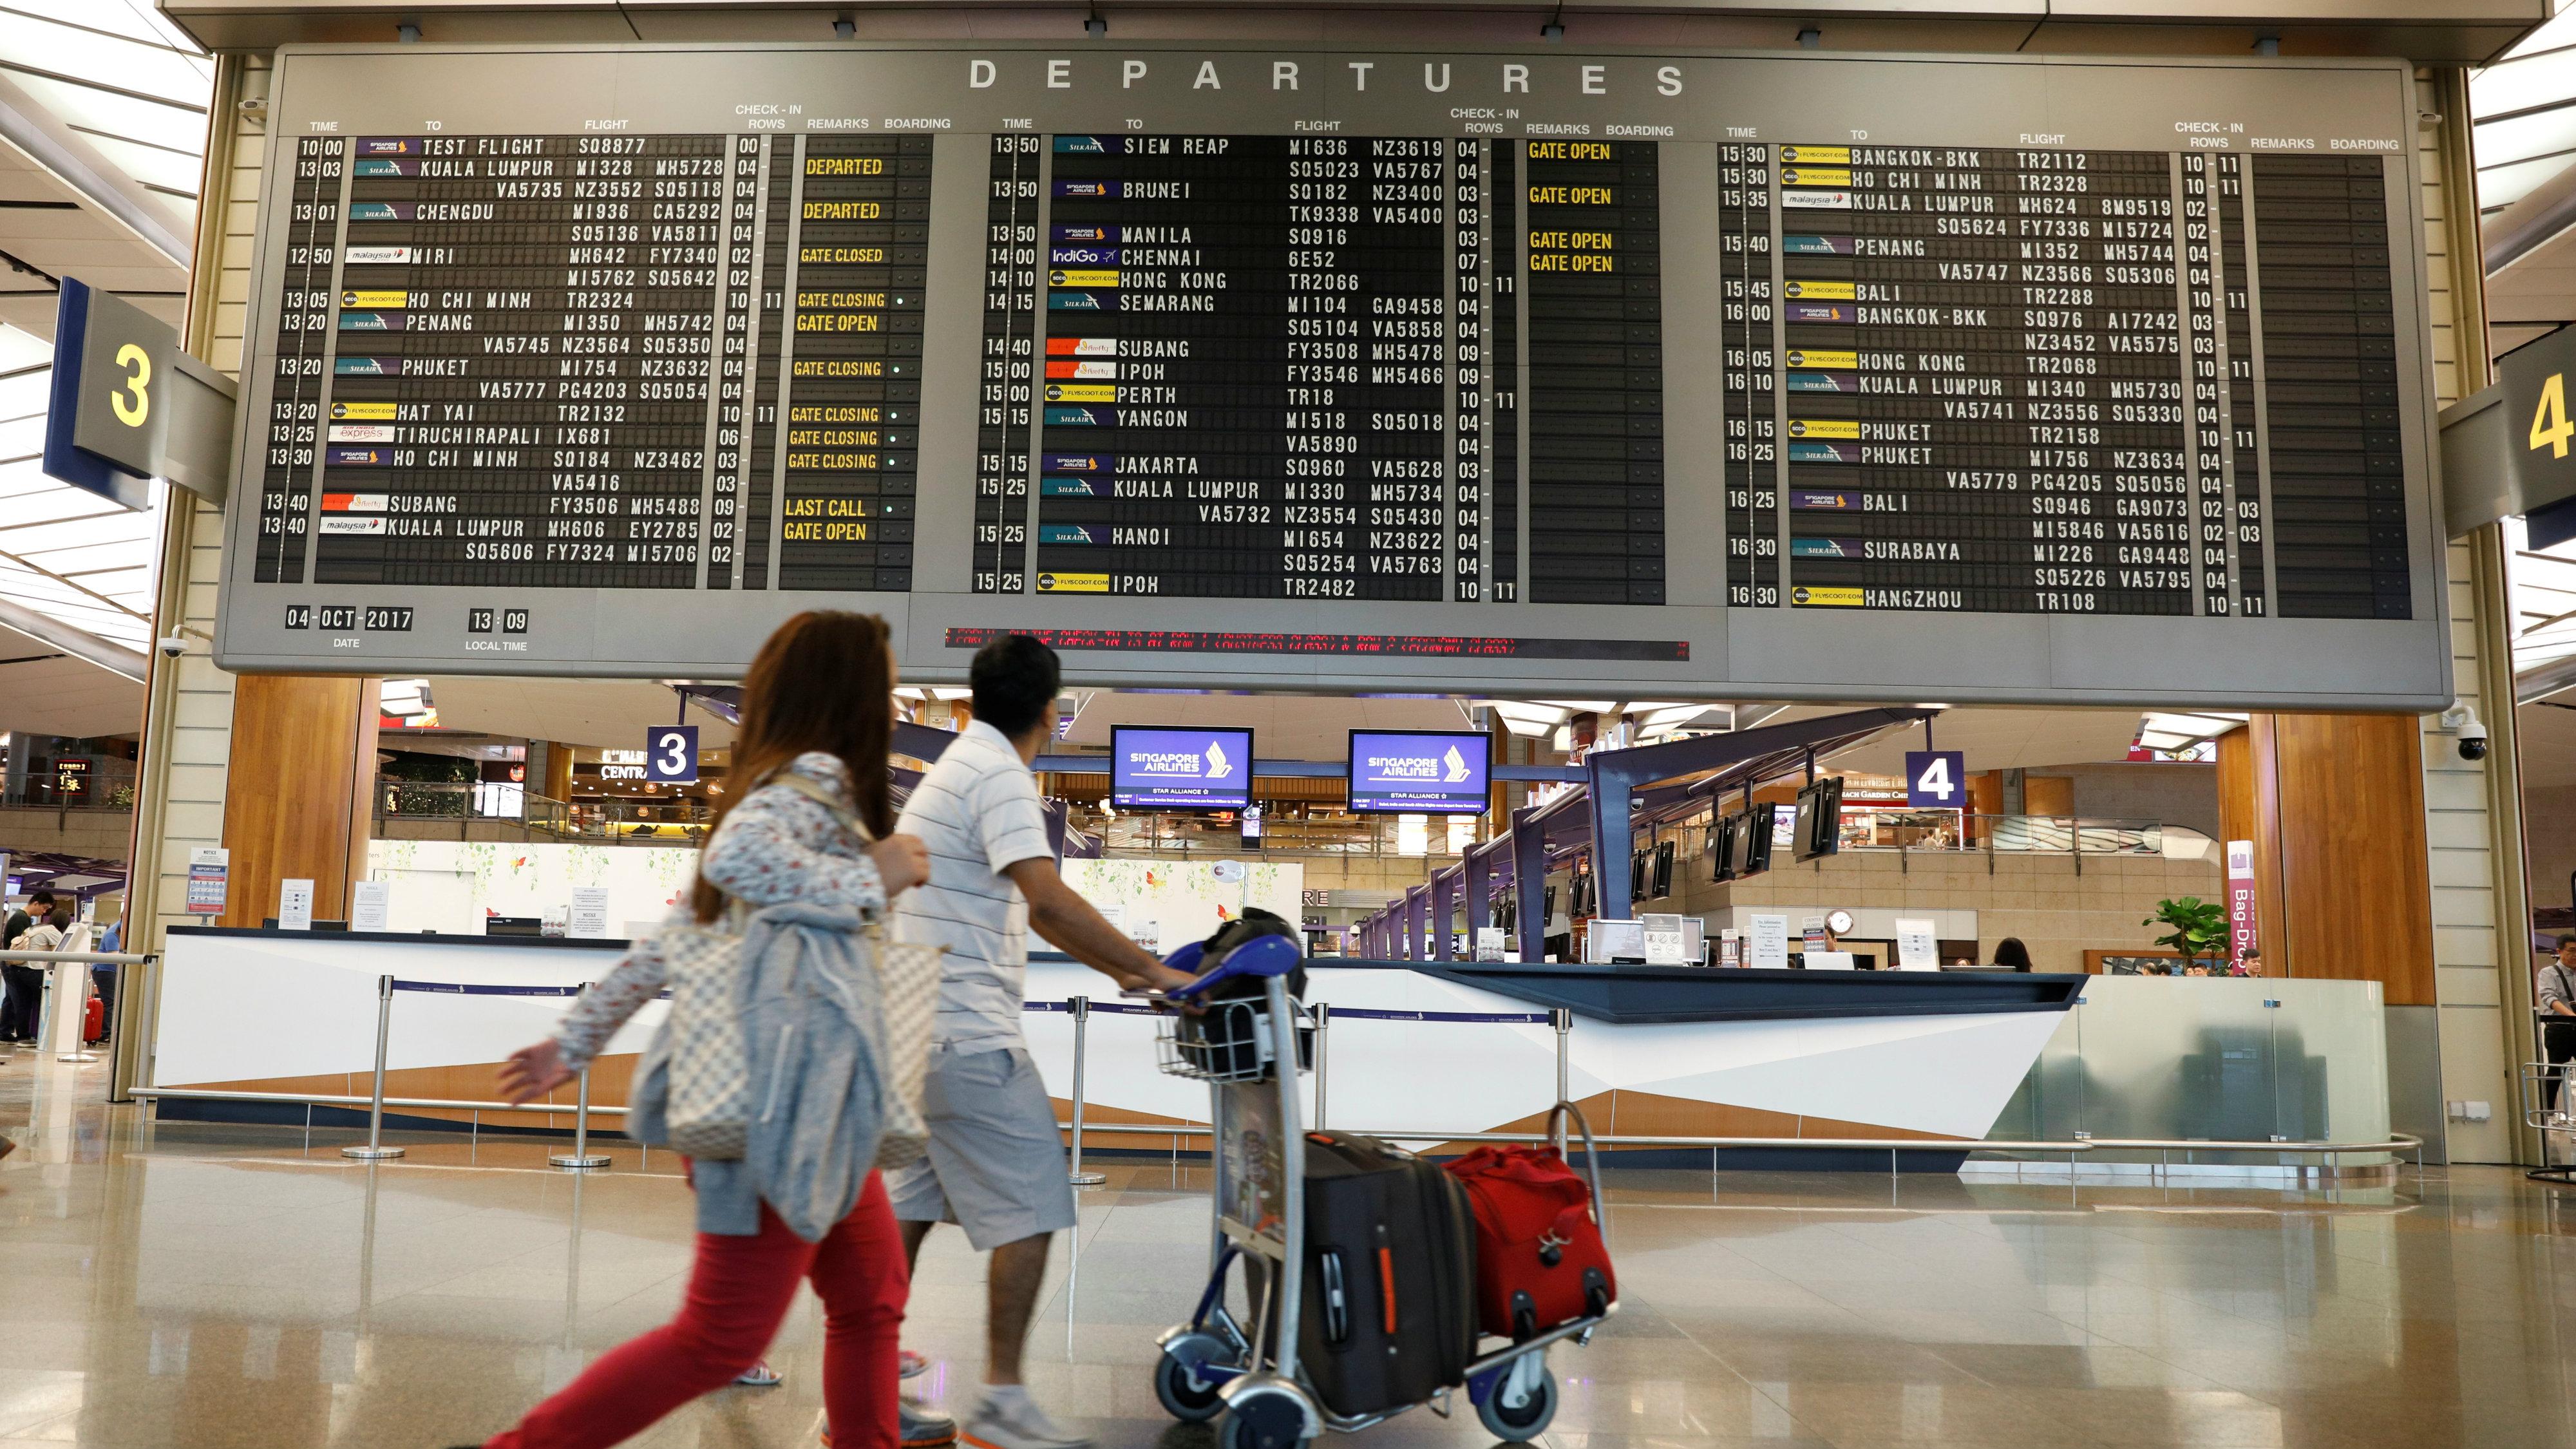 travelers walk past departures board